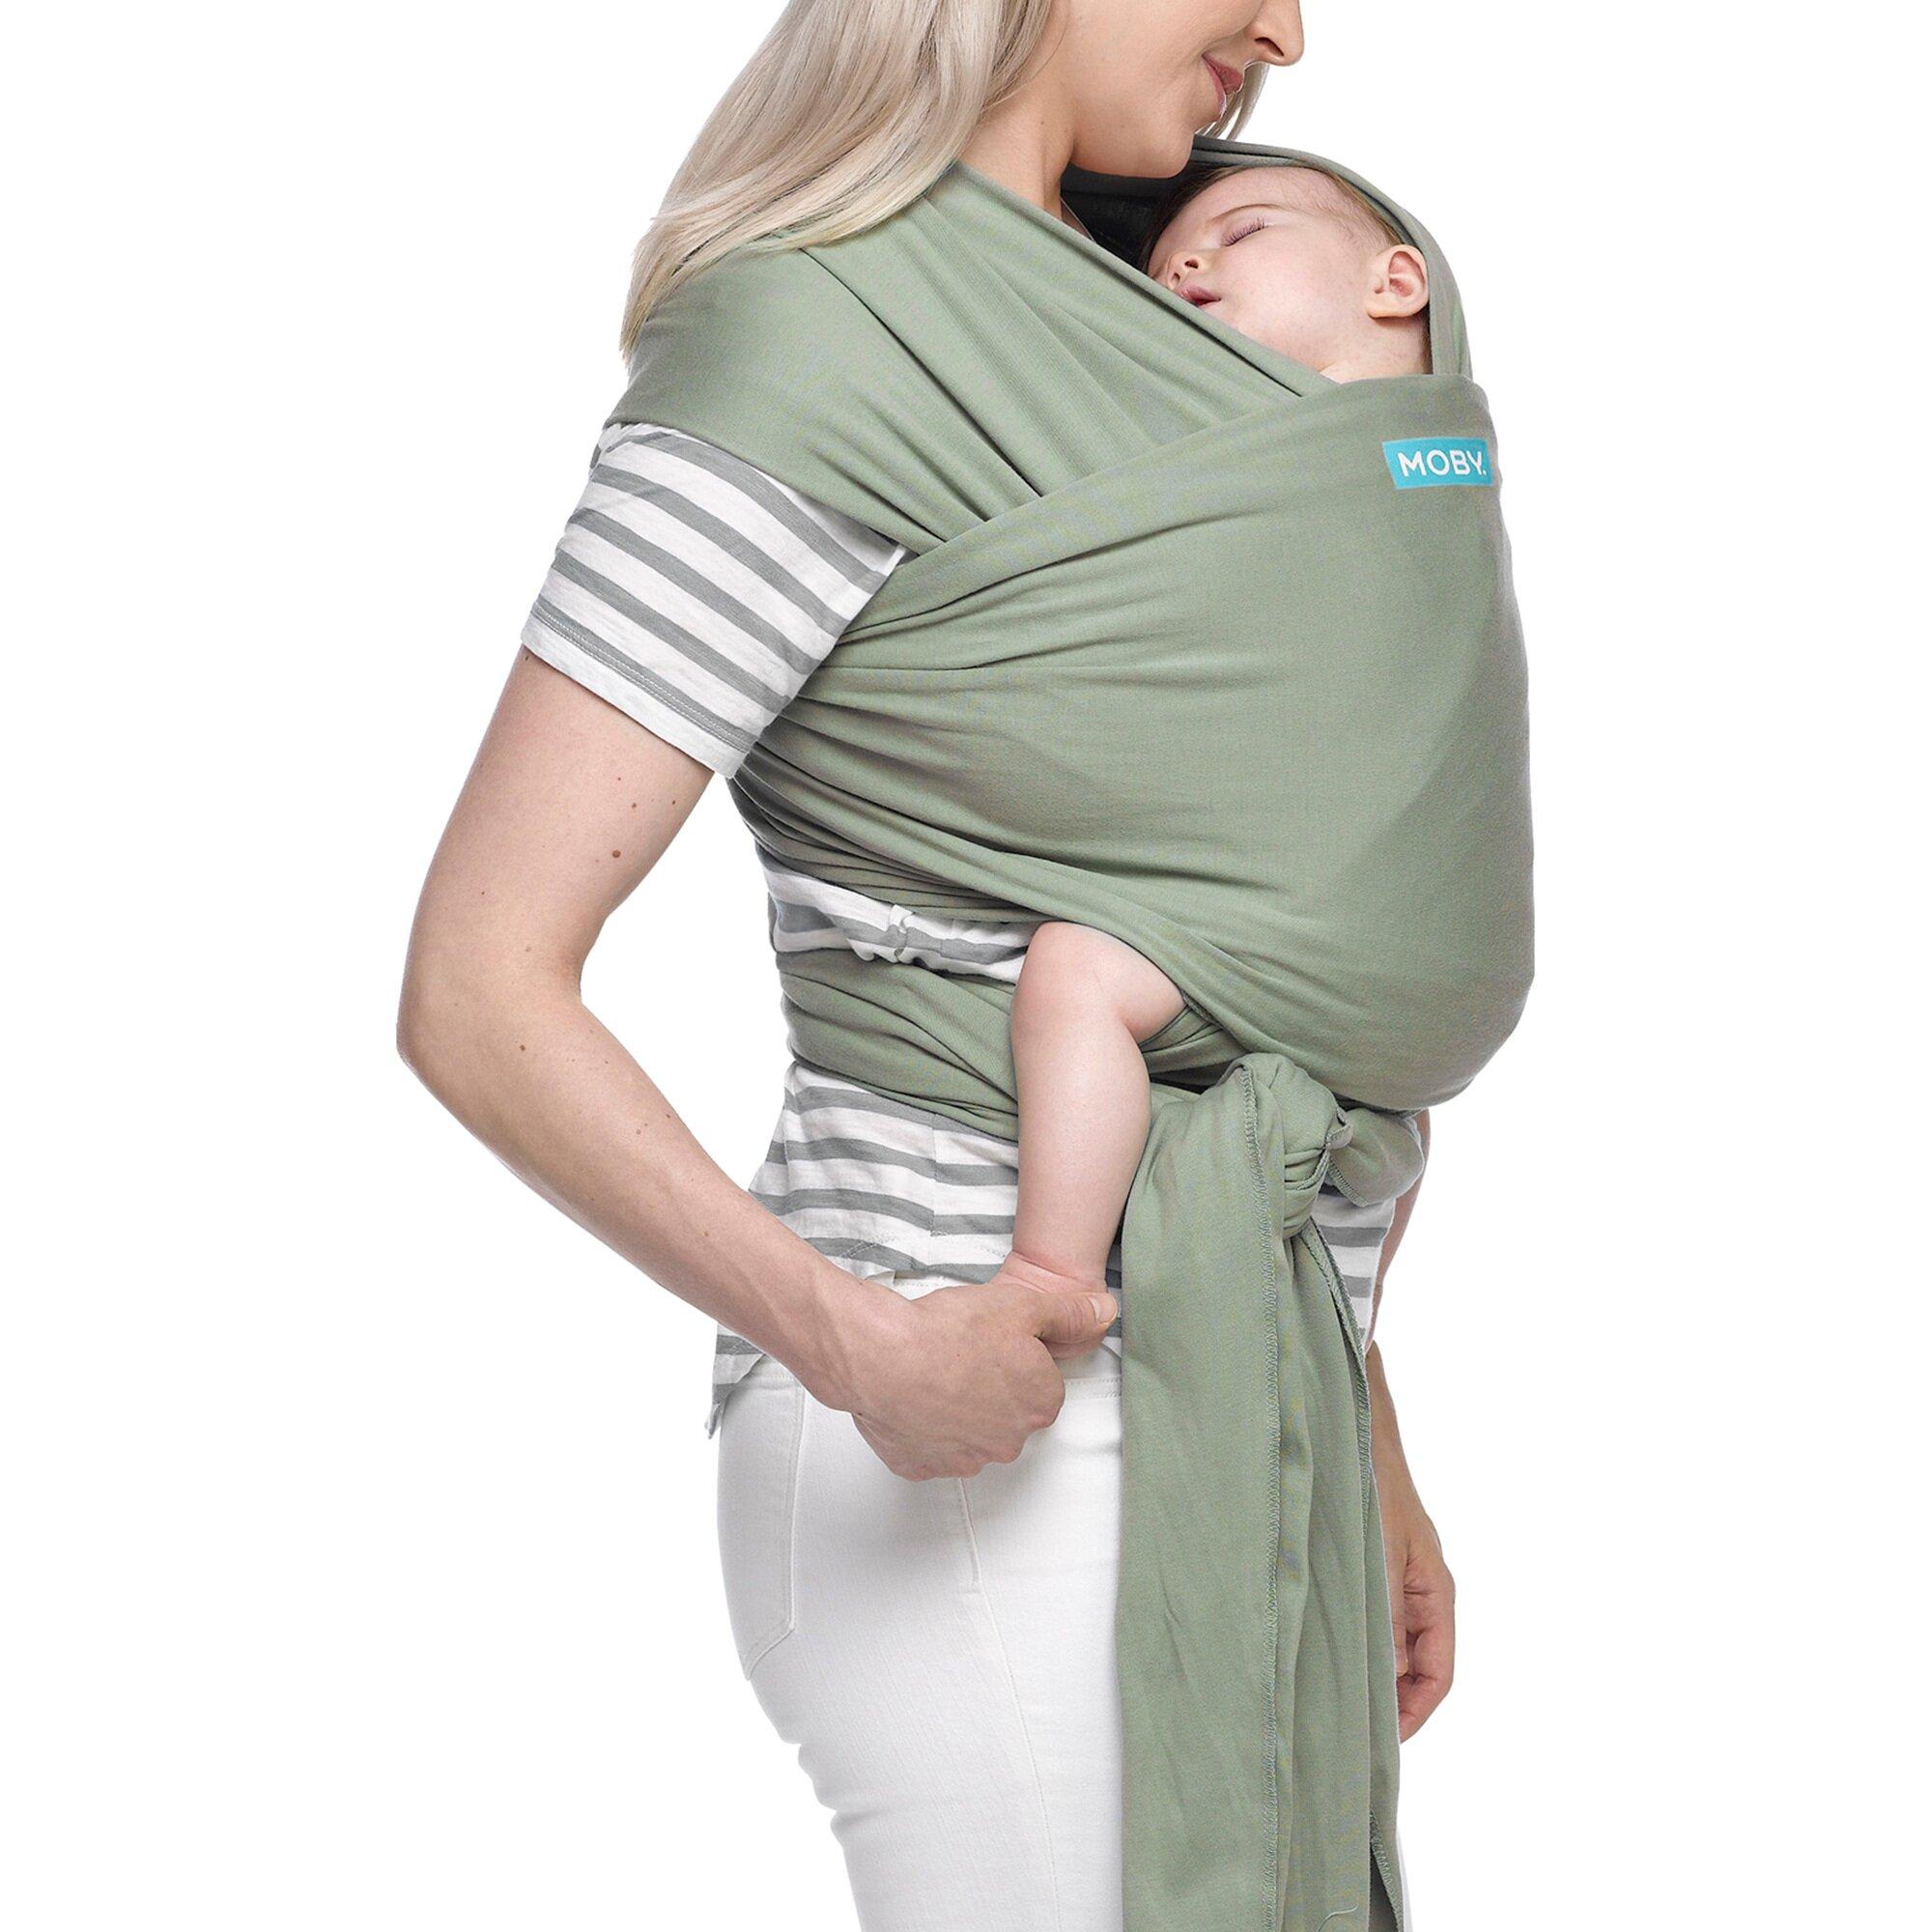 moby-wrap-classic-babytragetuch-550cm-gruen